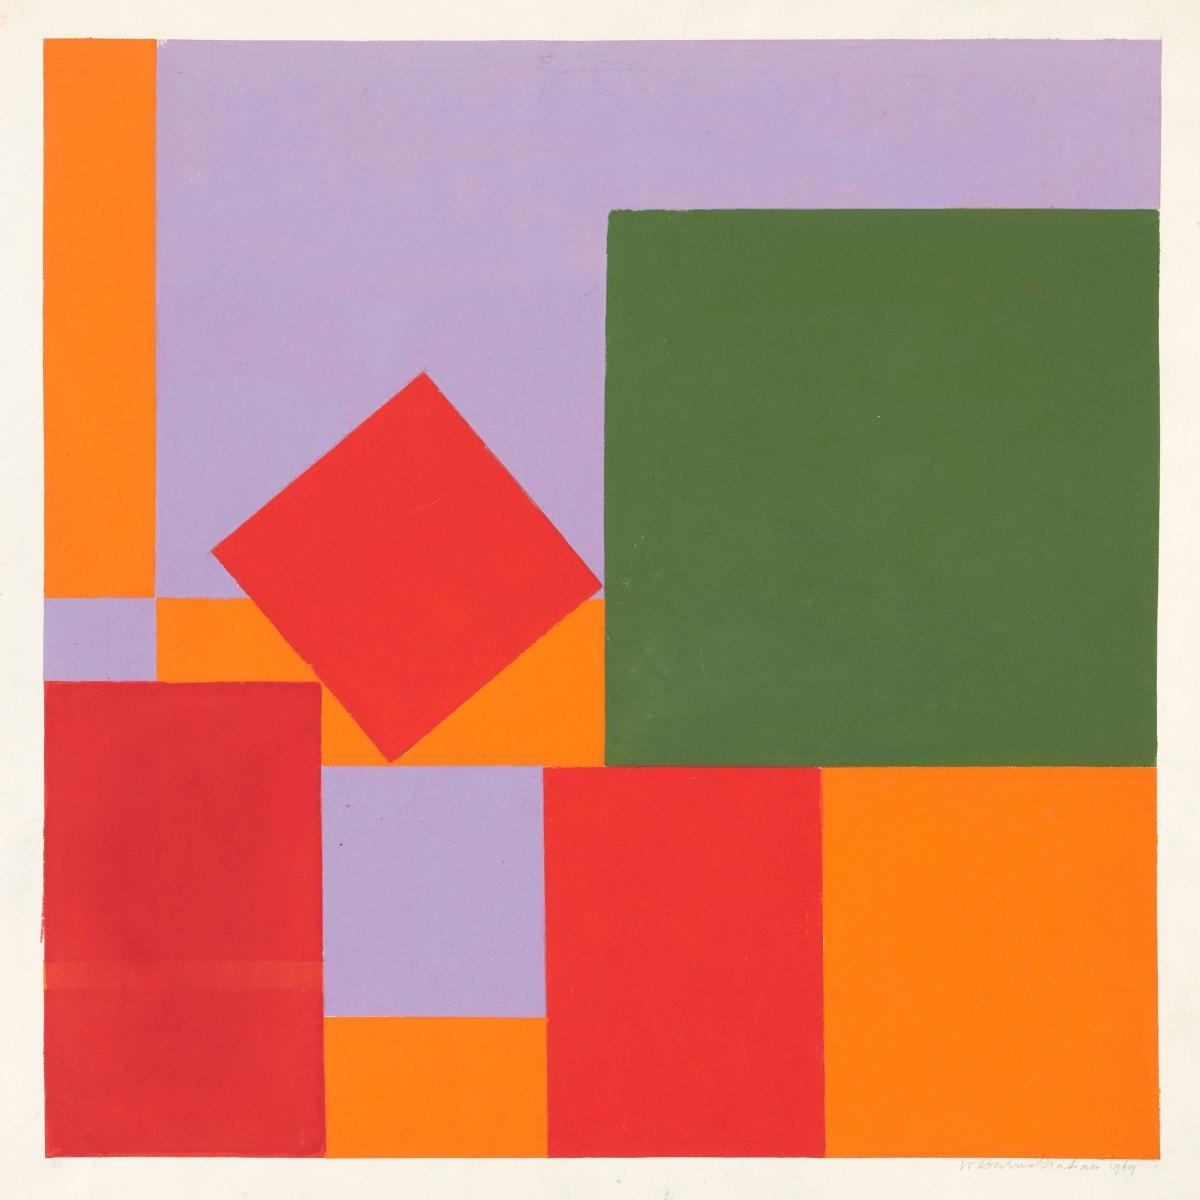 Wilhelmina Barns-Graham, Untitled, 1969